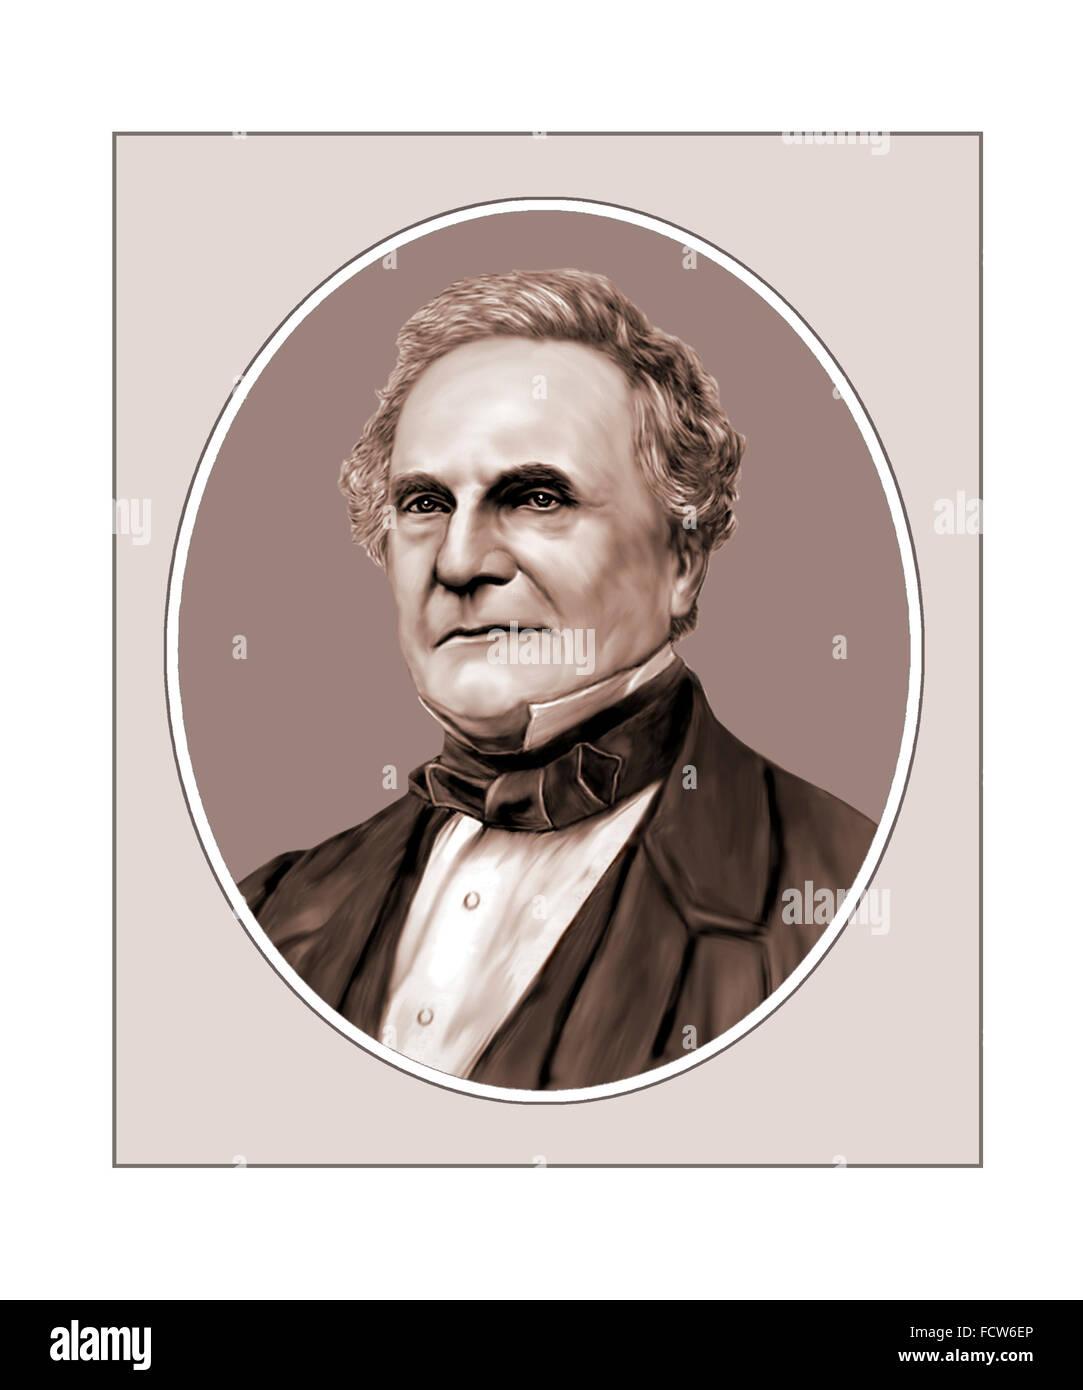 Charles Babbage, Polymath, Mathematician, Portrait - Stock Image